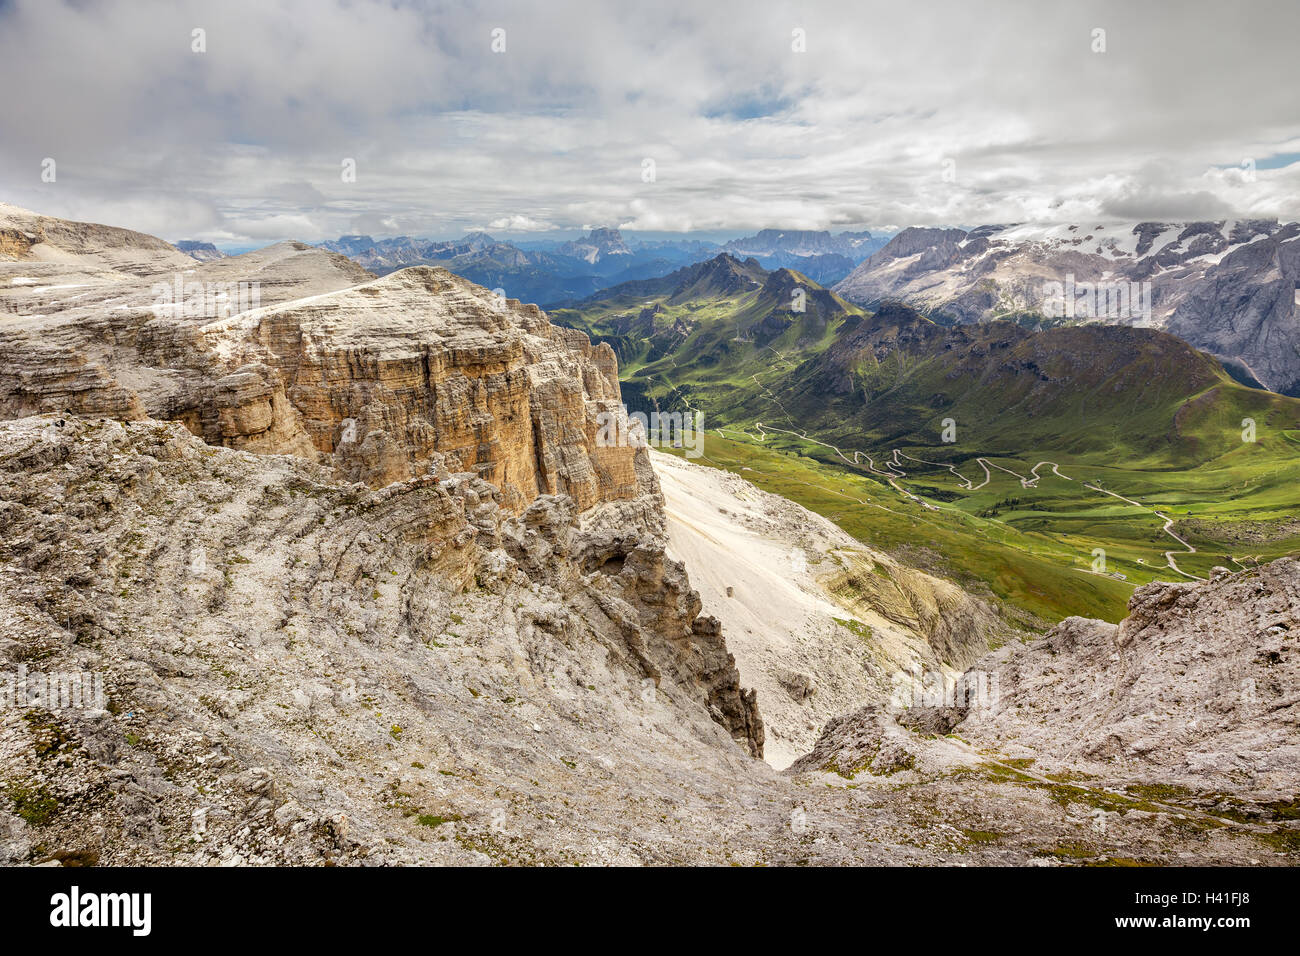 Pordoi pass mountain road valley and Piz Boe seen from the Sass Pordoi plateau in Dolomites, Italy, Europe - Stock Image